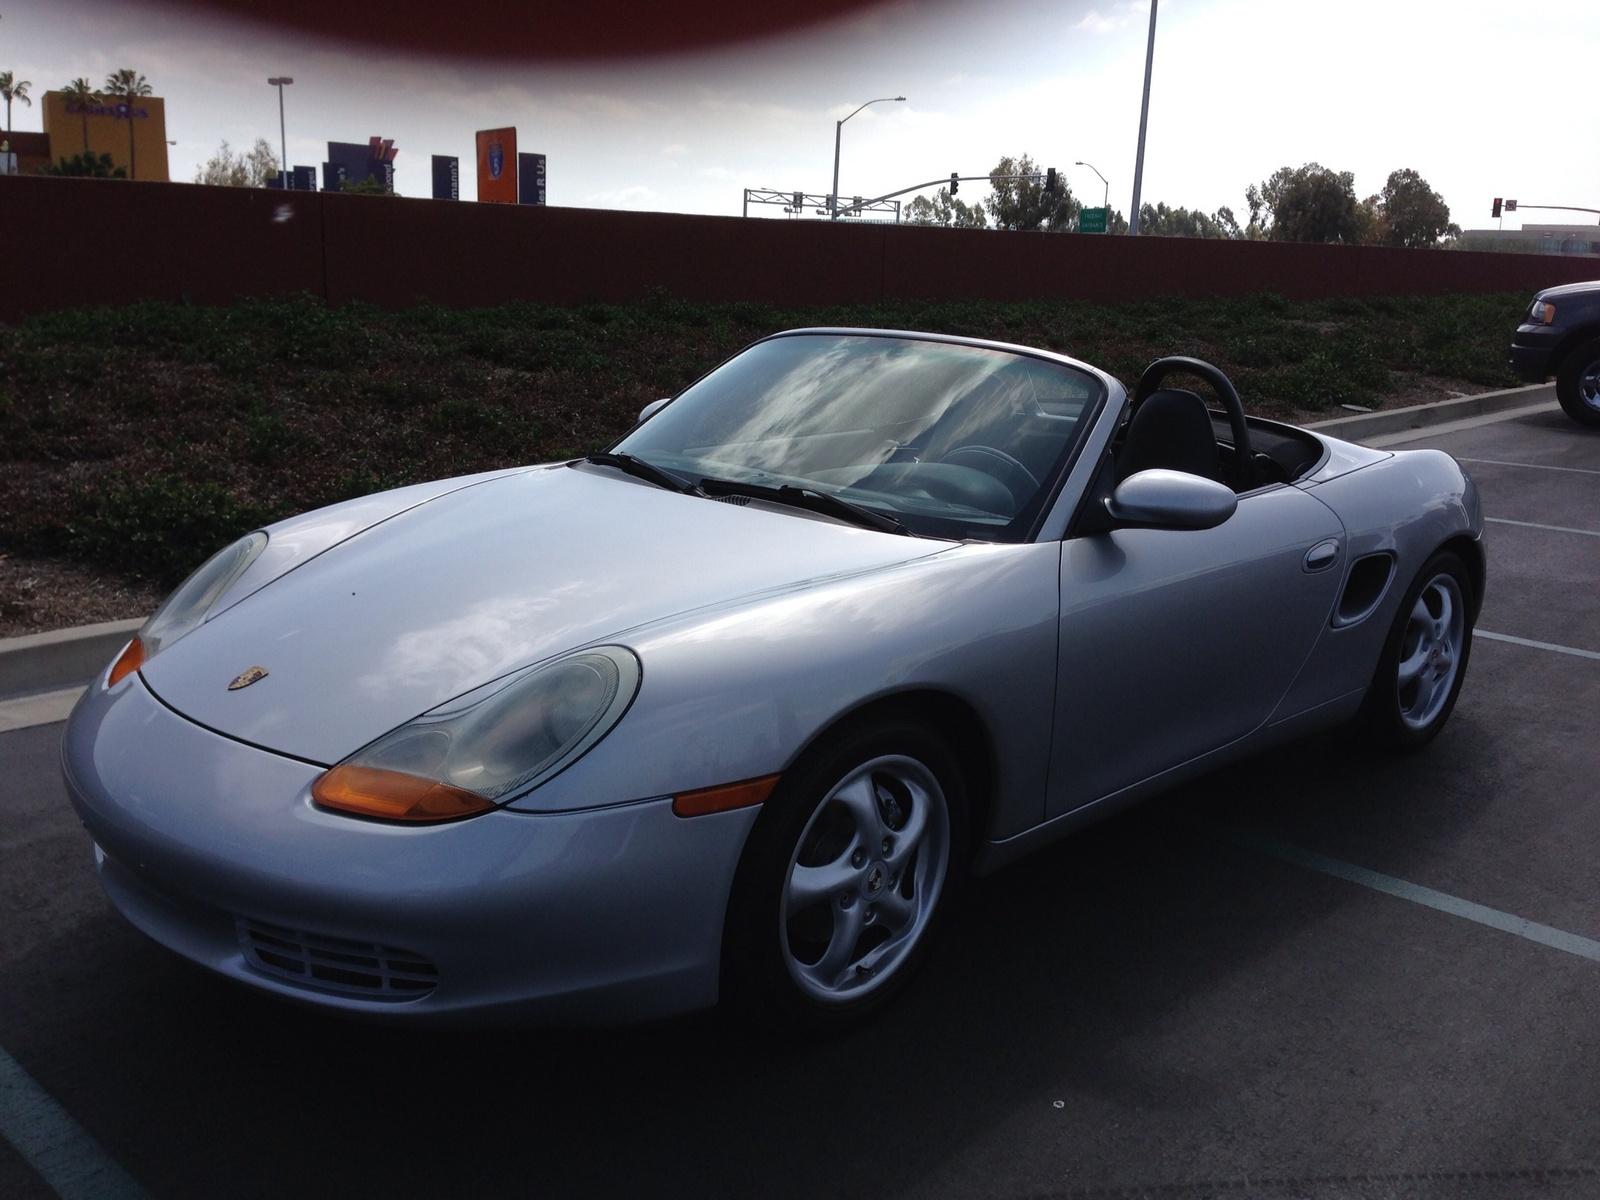 1999 Porsche Boxster Pictures Cargurus